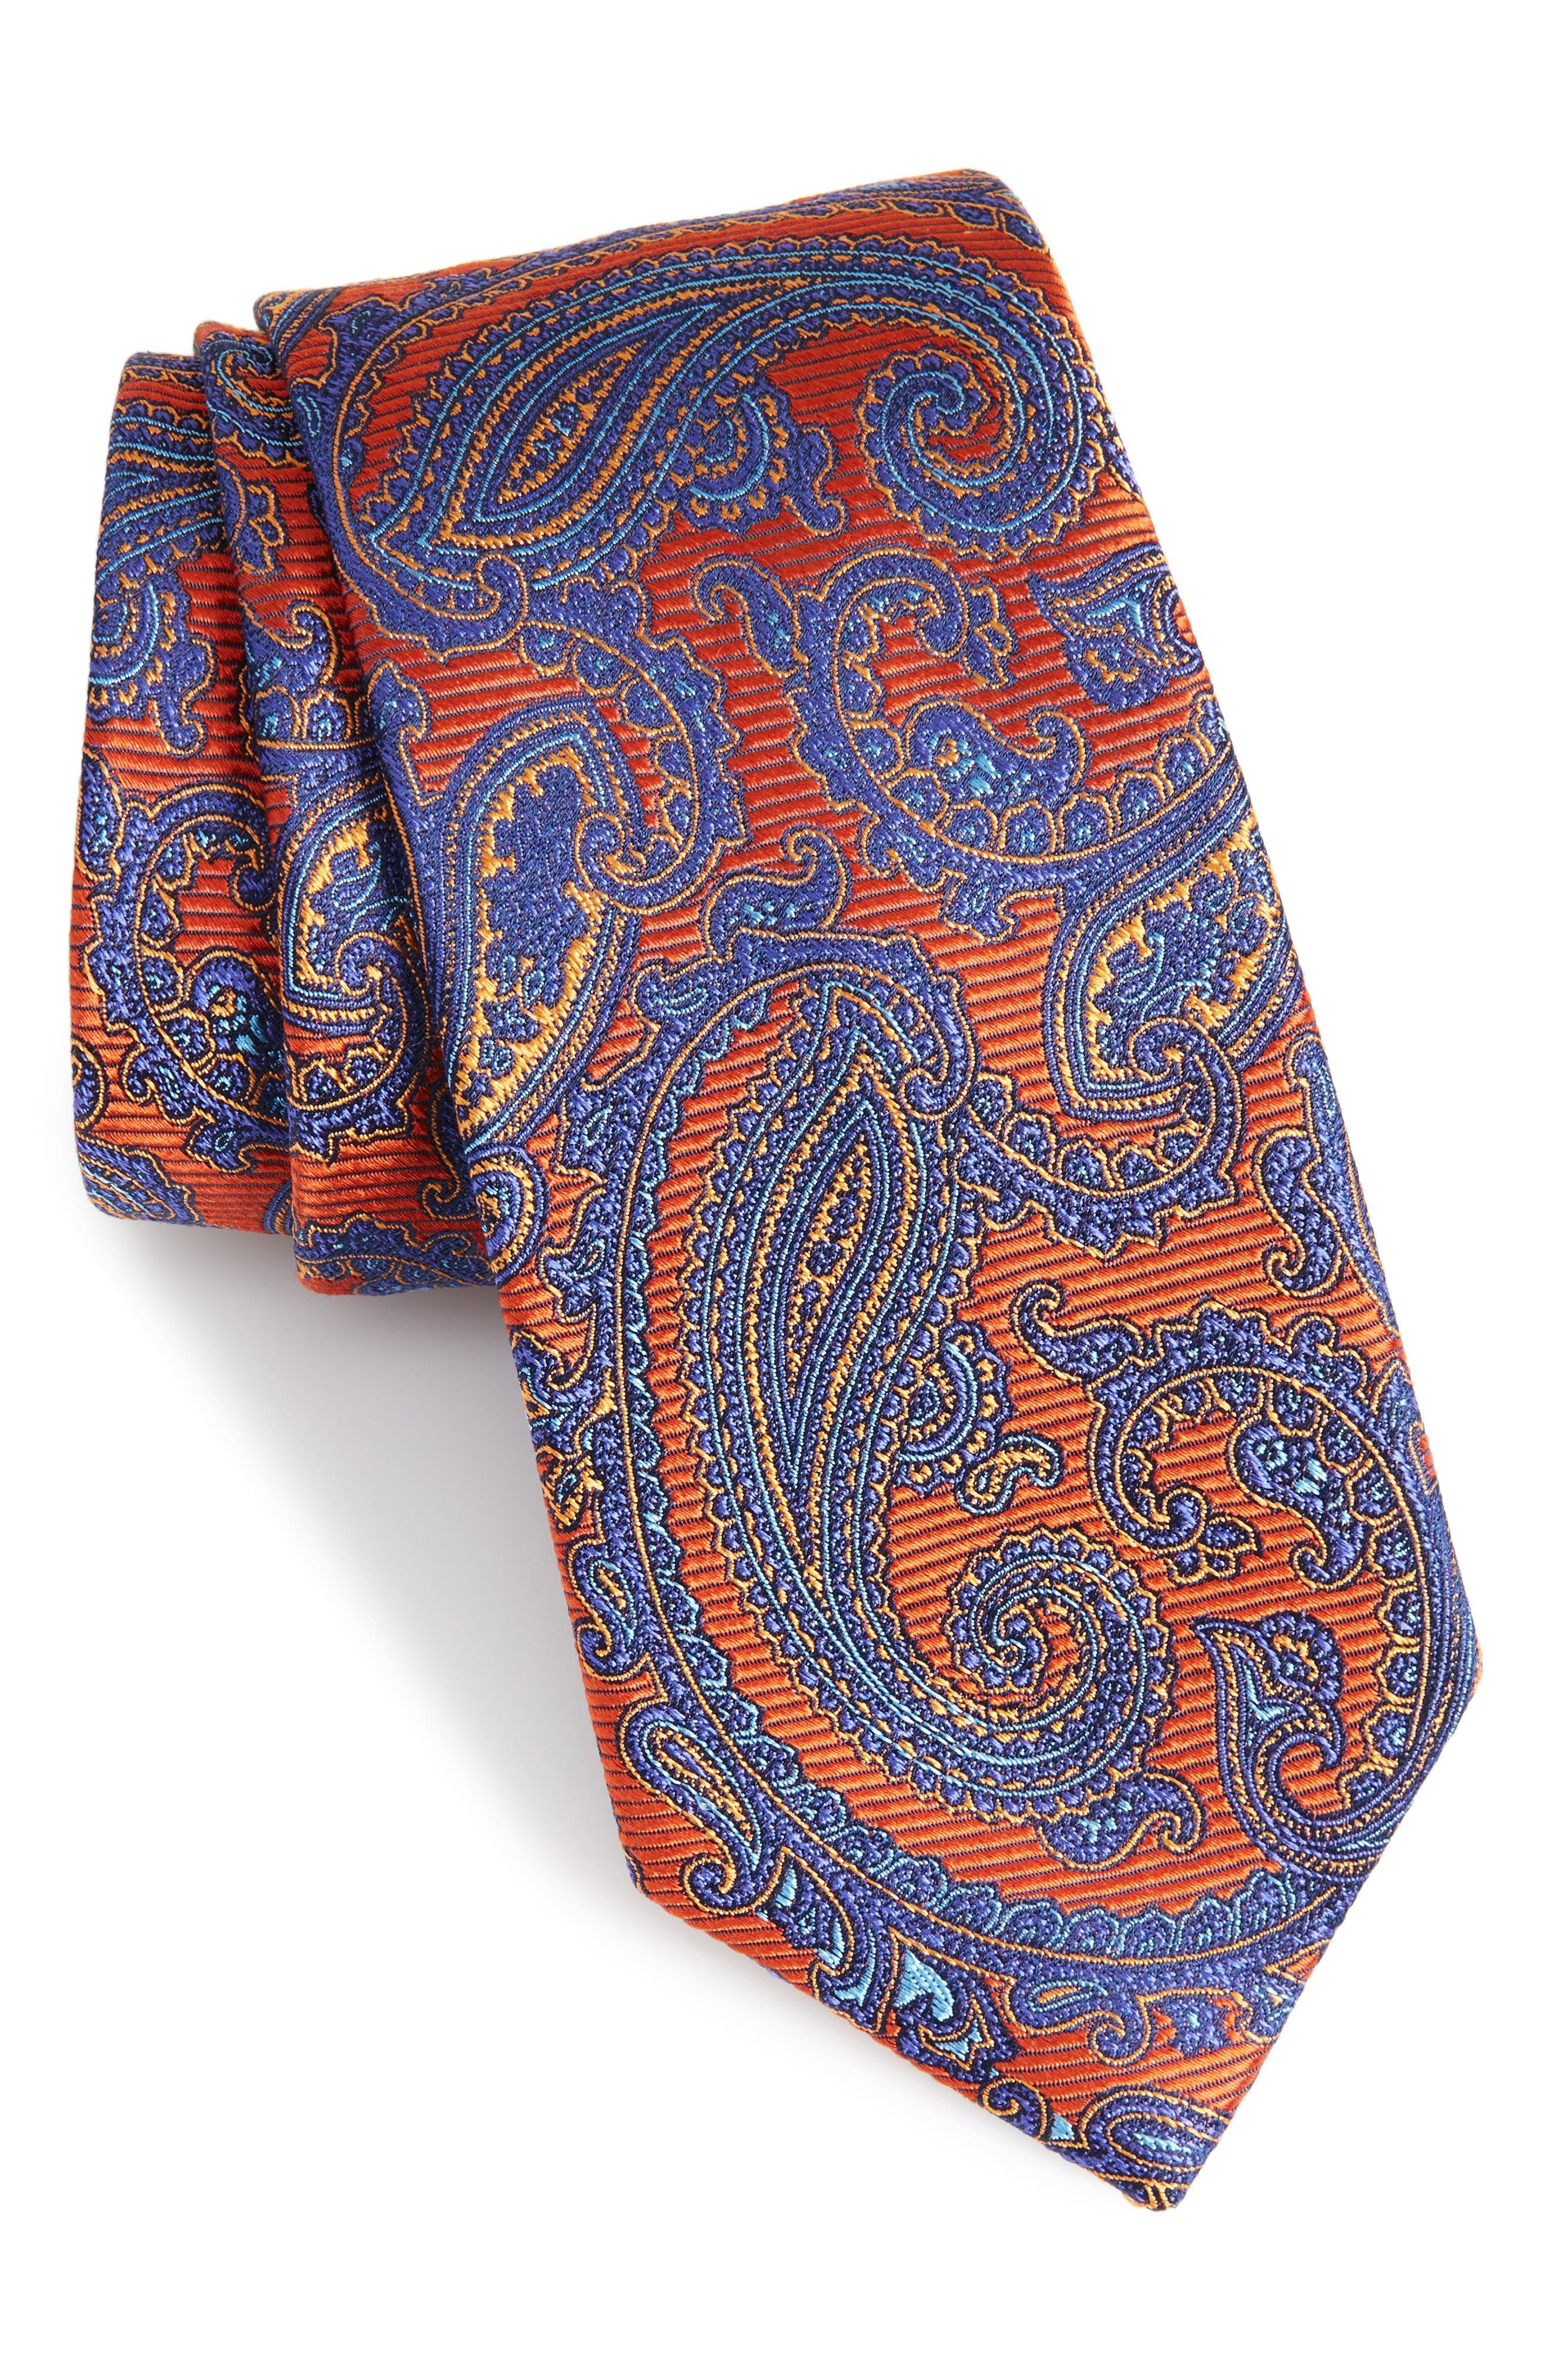 Alternate Image 1 Selected - Nordstrom Men's Shop Brielle Paisley Silk Tie